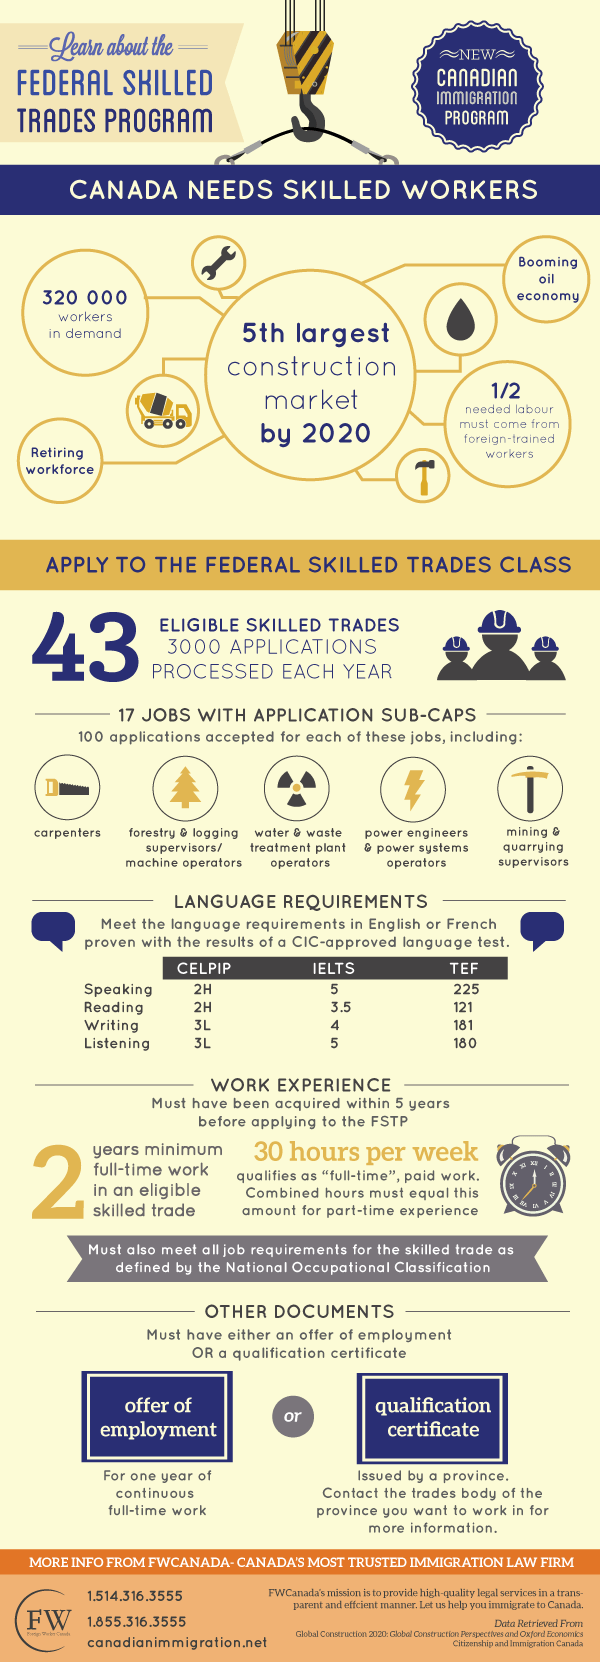 learn-about-canadas-federal-skilled-trades-program_52137b0f86378